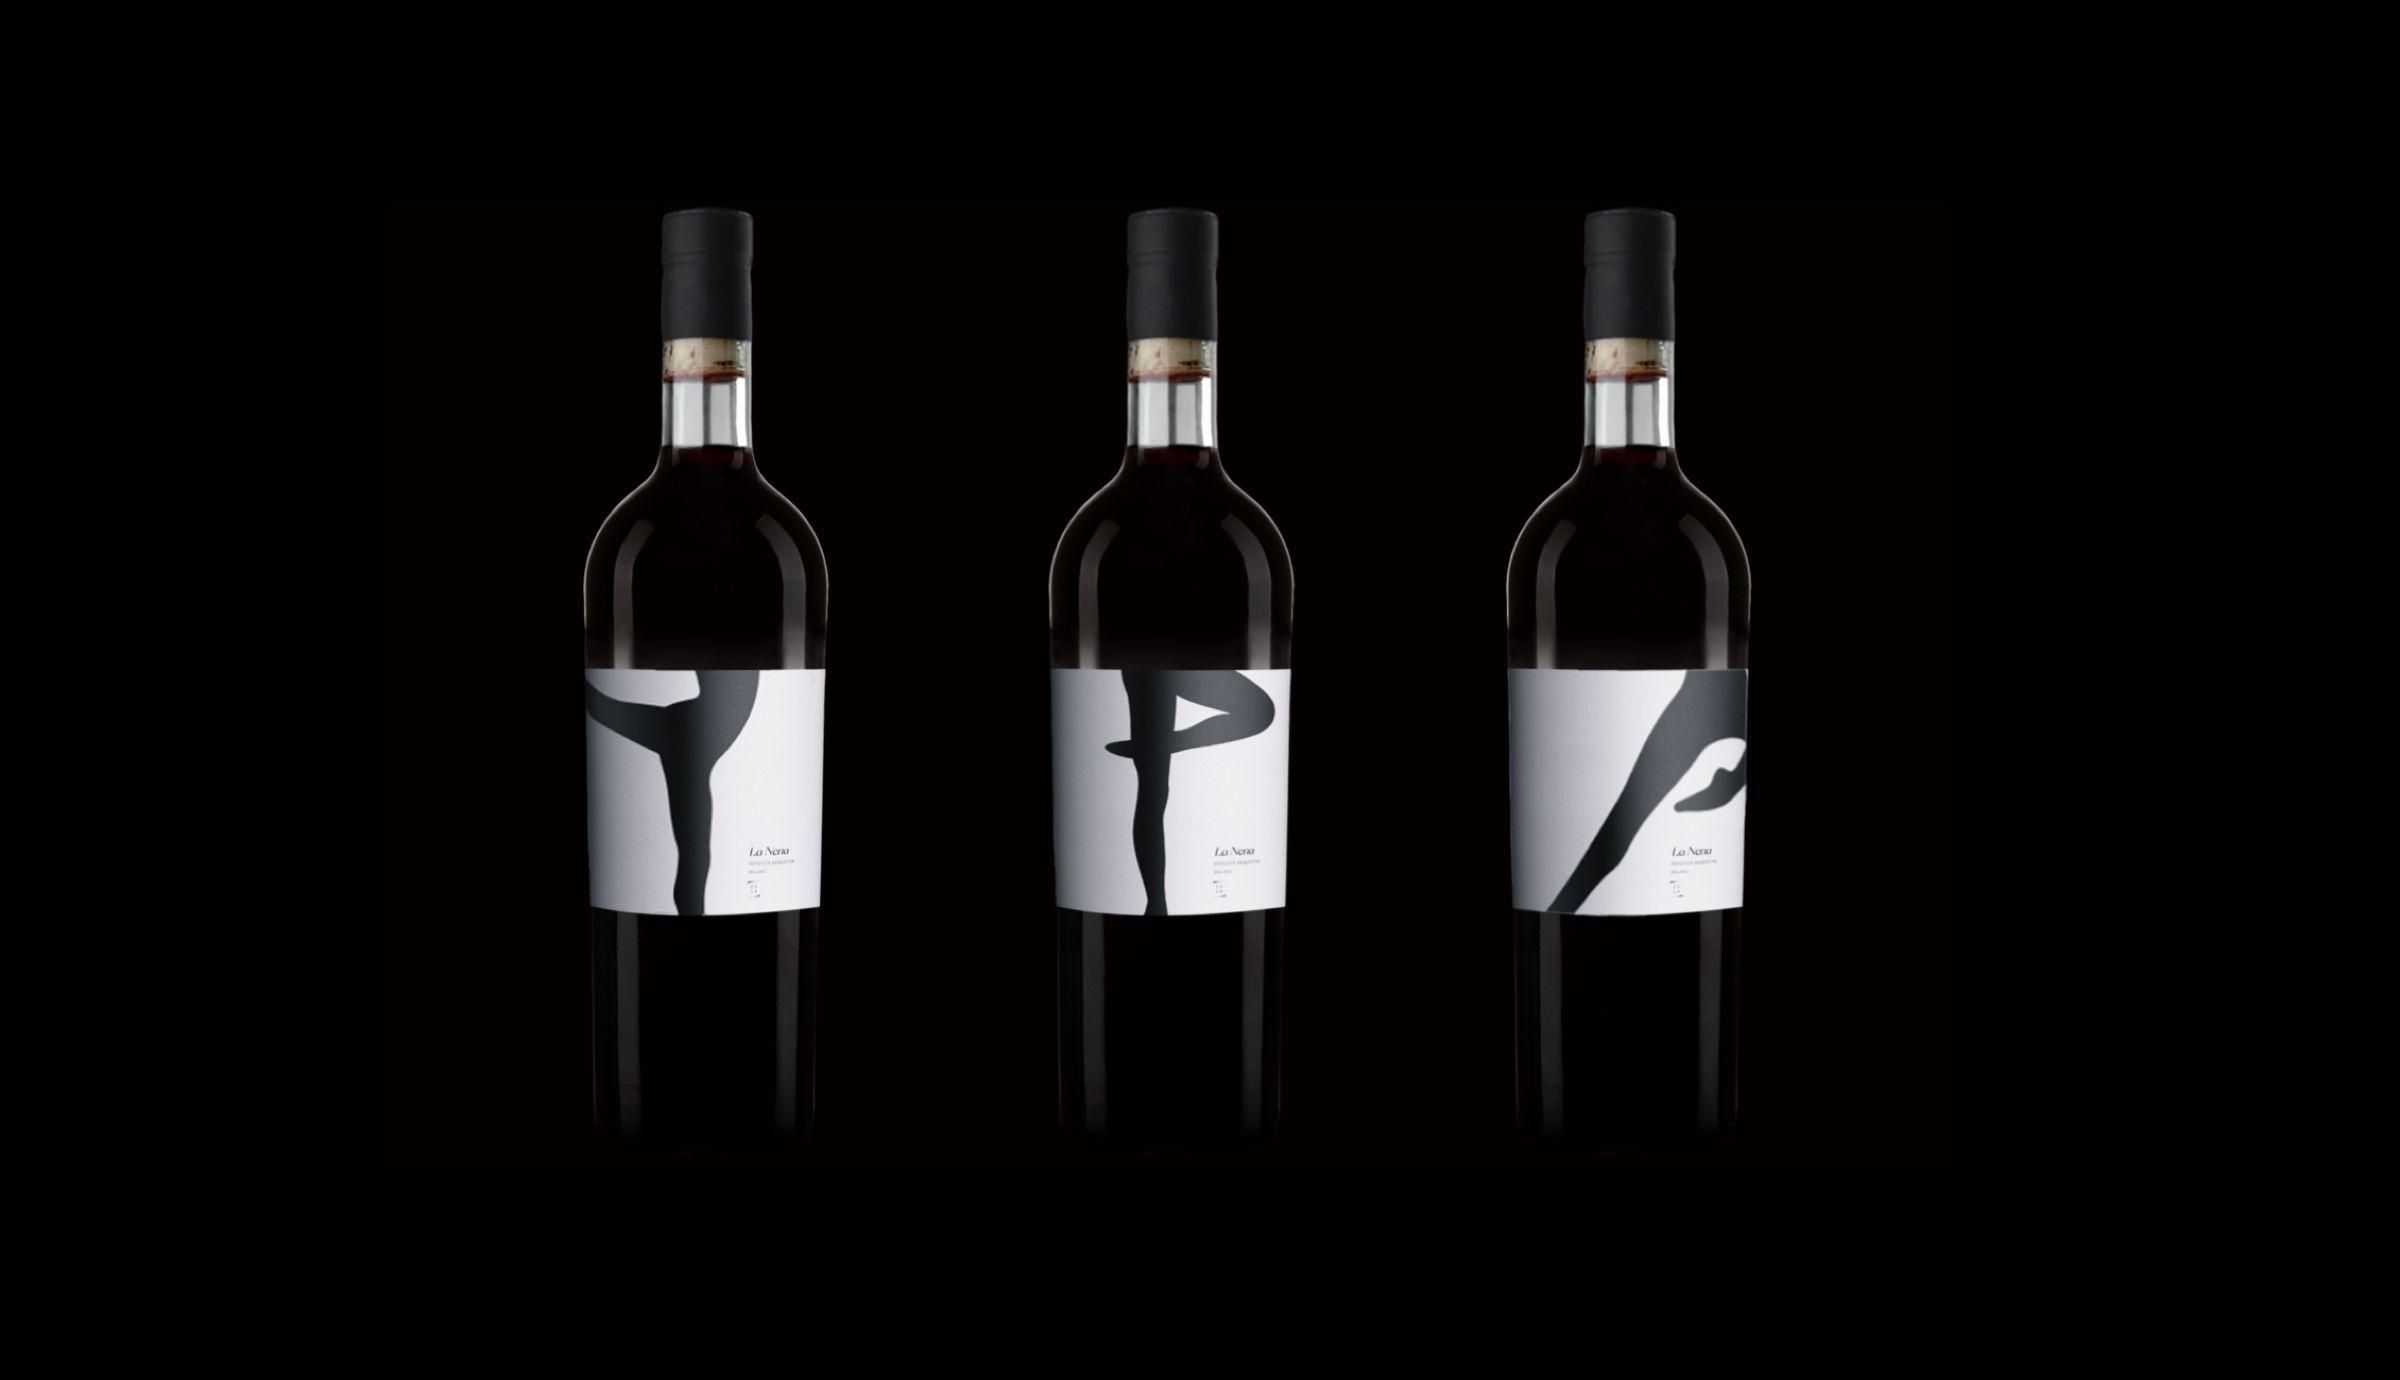 Branding for winery